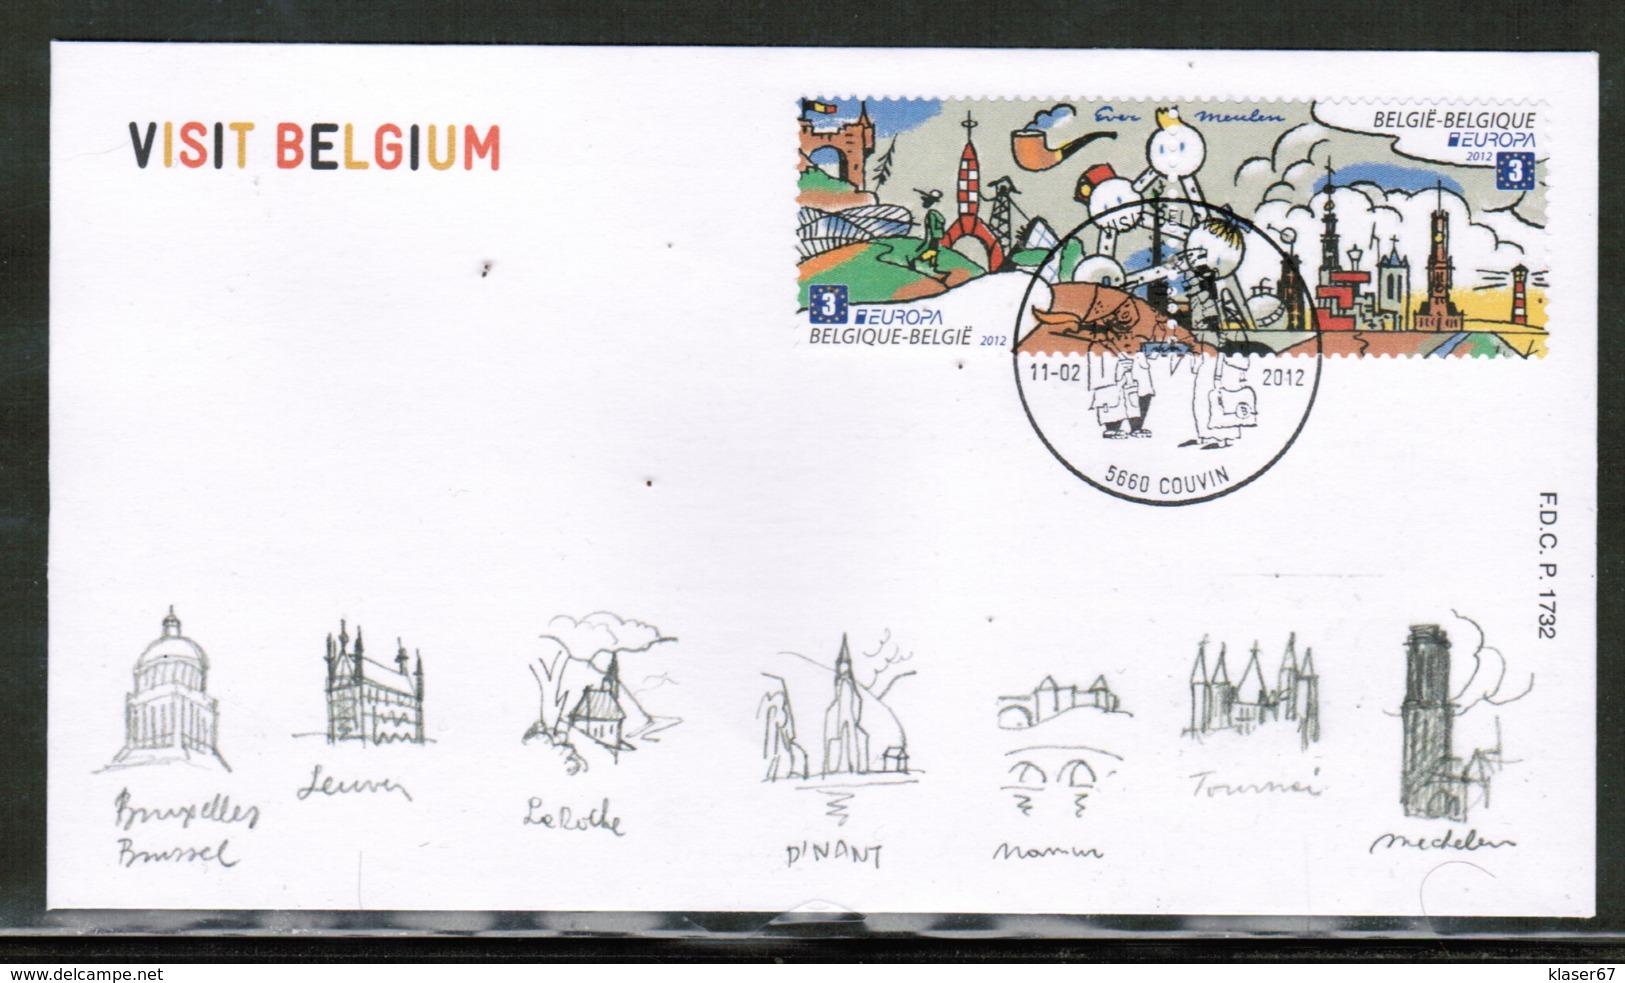 CEPT 2012 BE MI 4262-63 BELGIUM FDC - Europa-CEPT